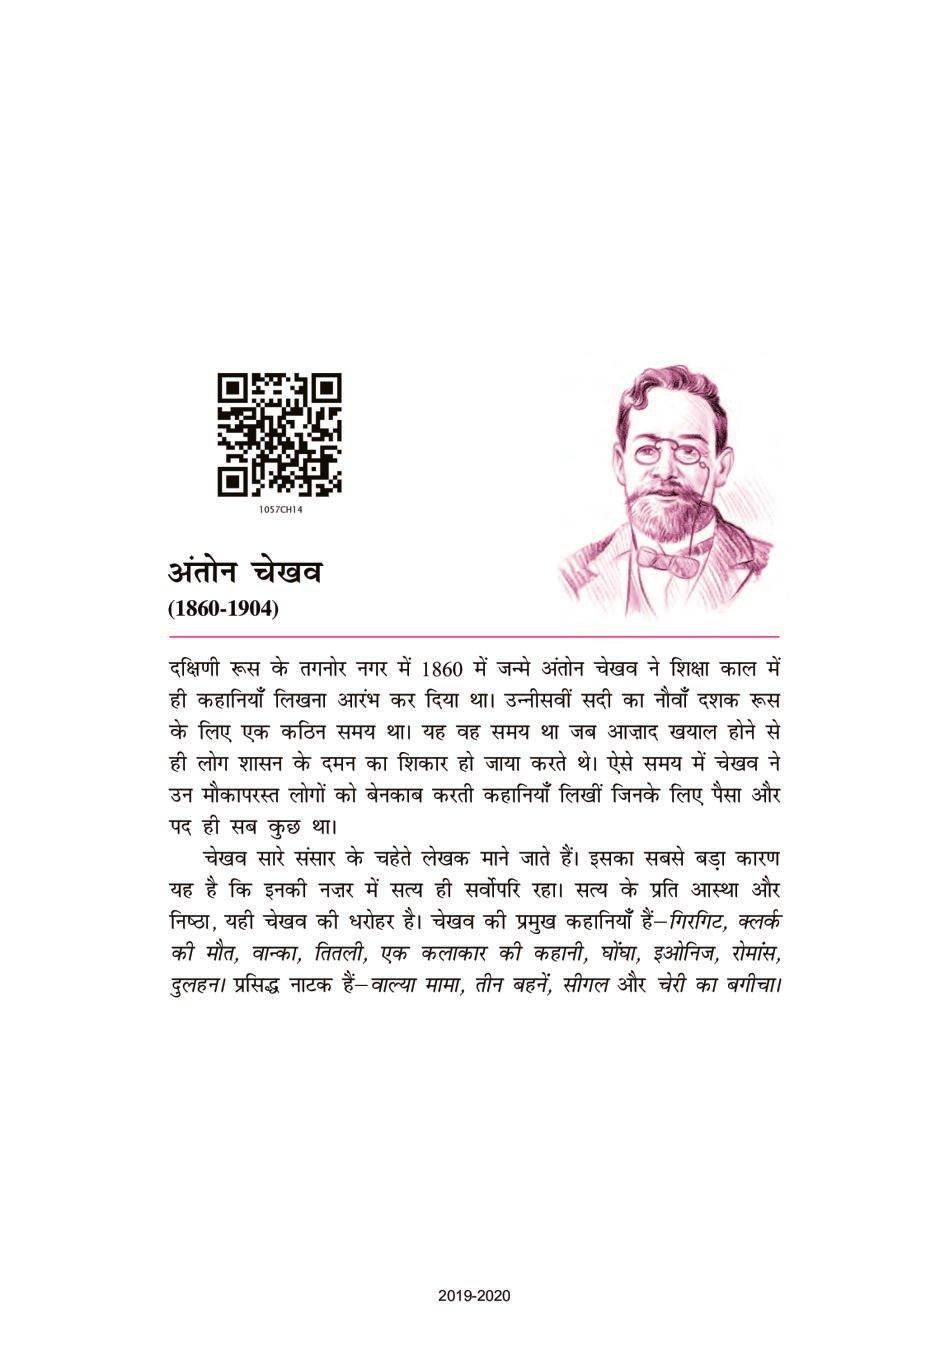 NCERT Book Class 10 Hindi (स्पर्श) Chapter 14 गिरगिट - Page 1